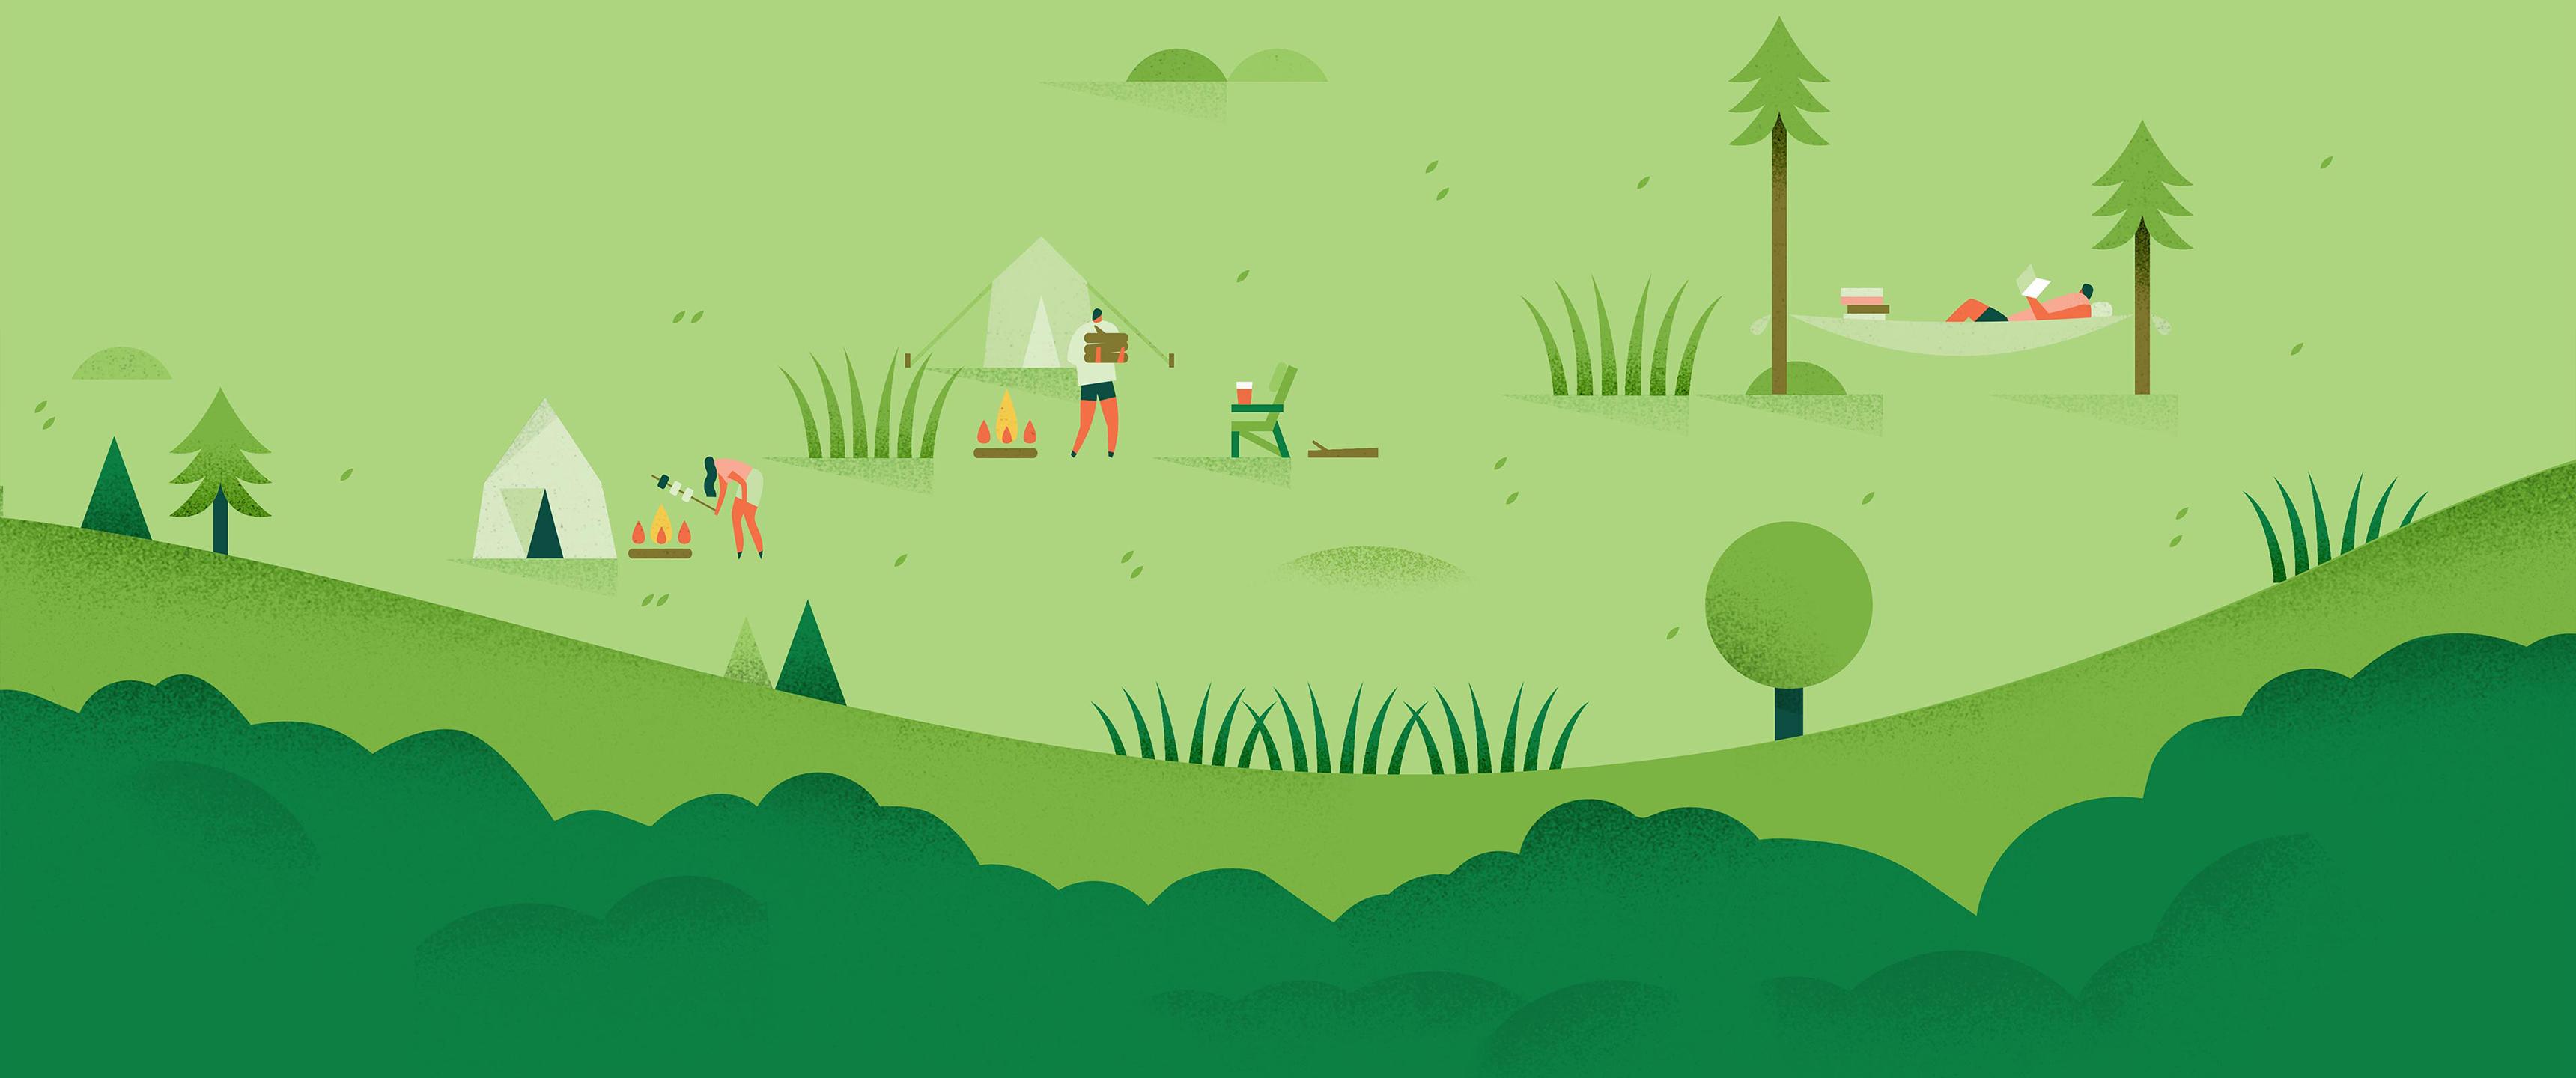 Wallpaper : forest, illustration, minimalism, green ...